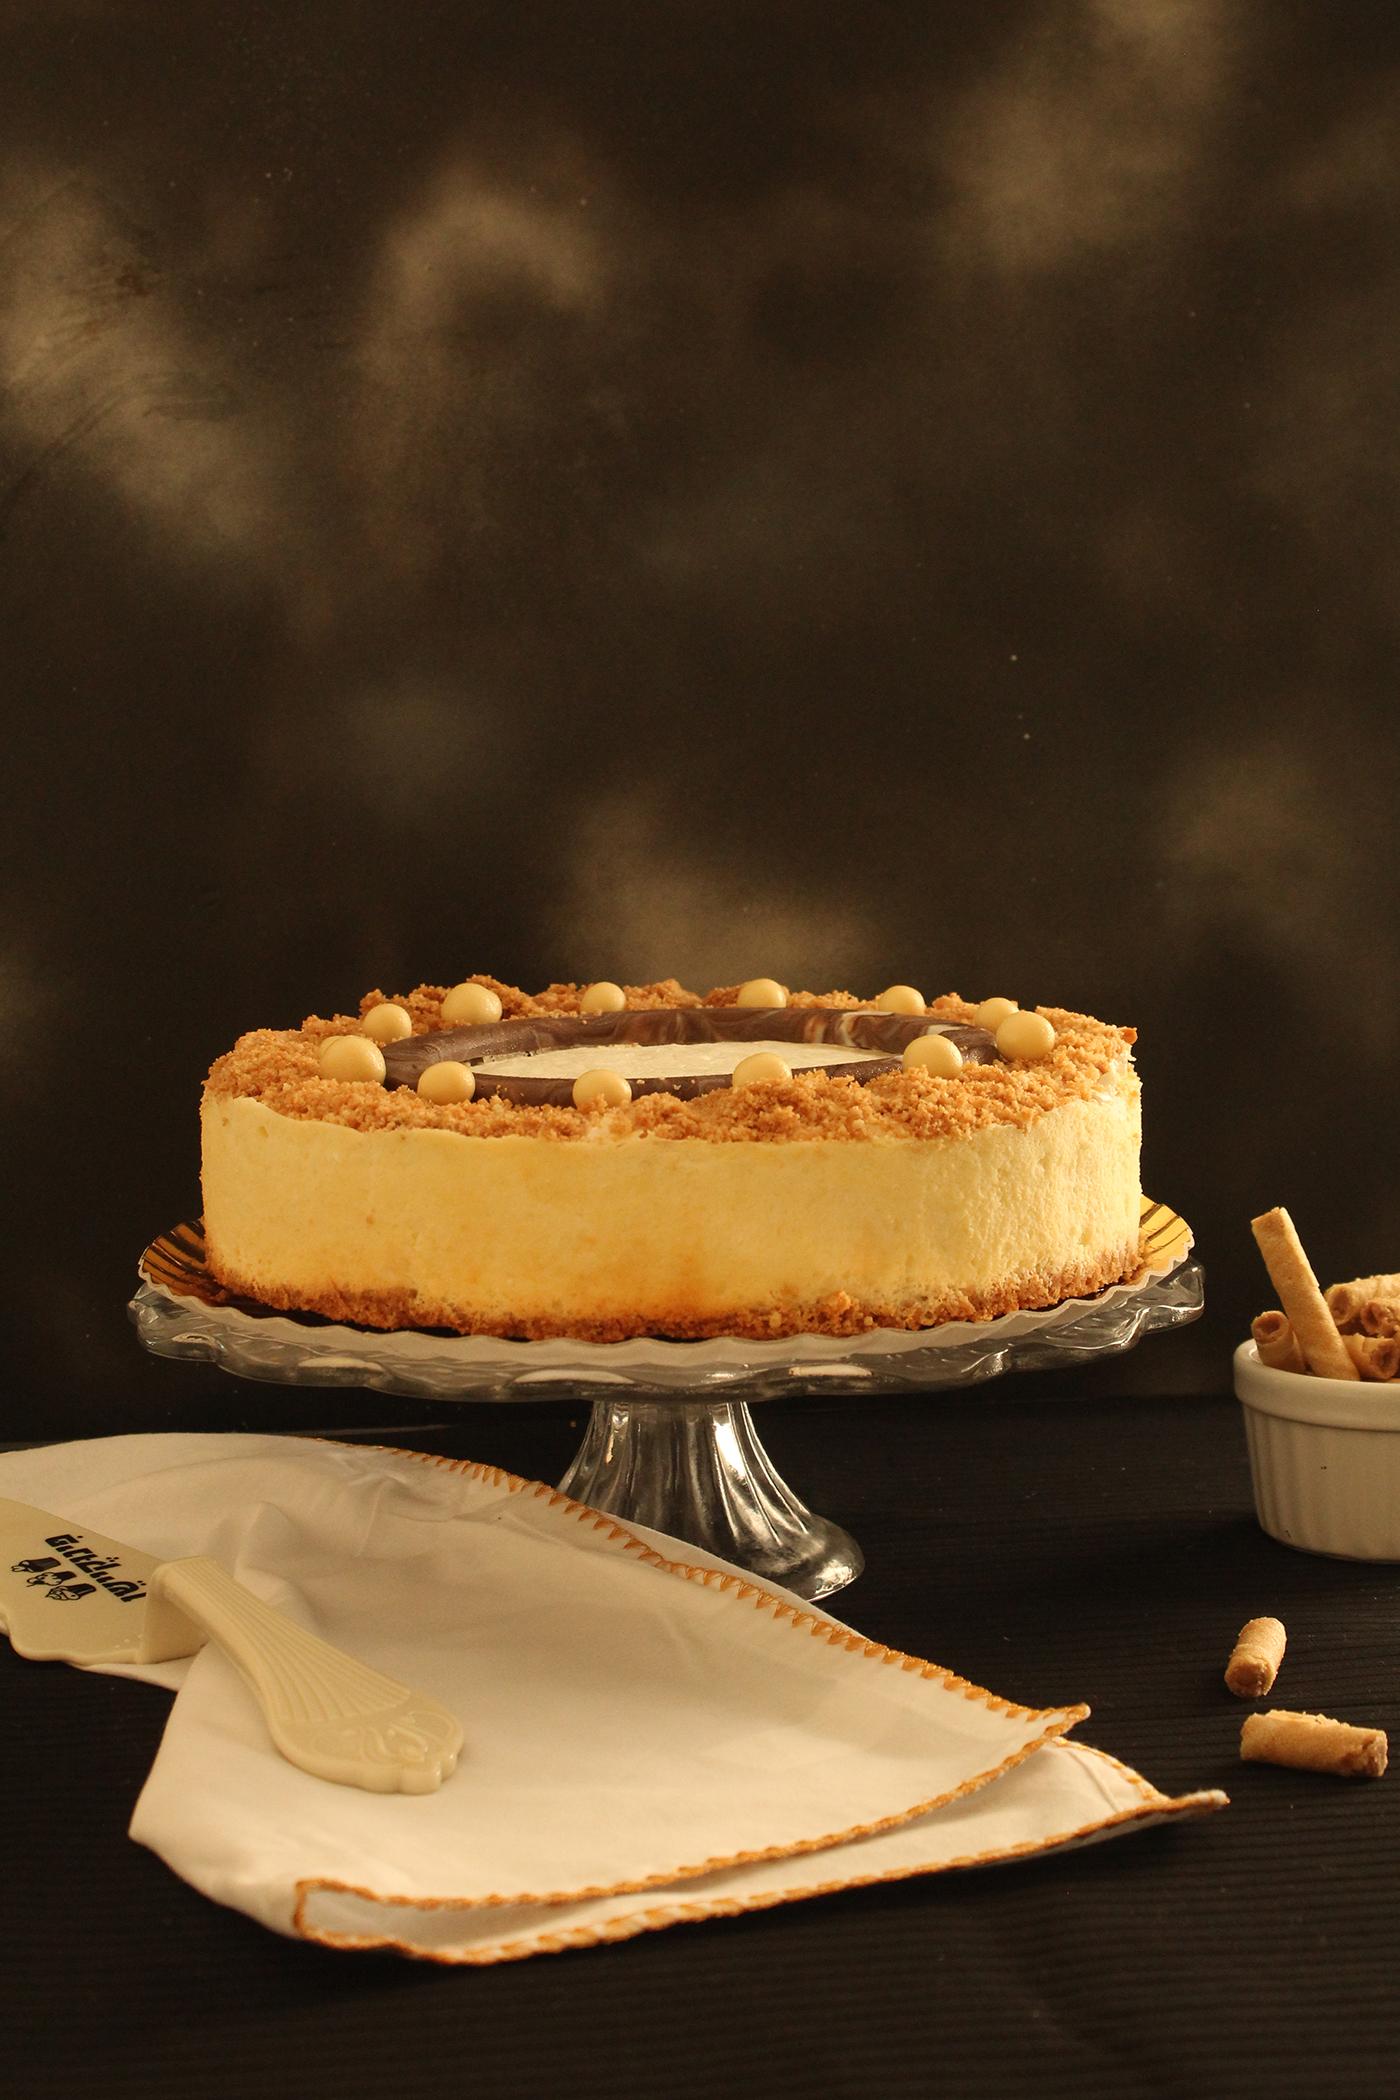 IMG 8283 - עוגת גבינה גבוהה וטעימה